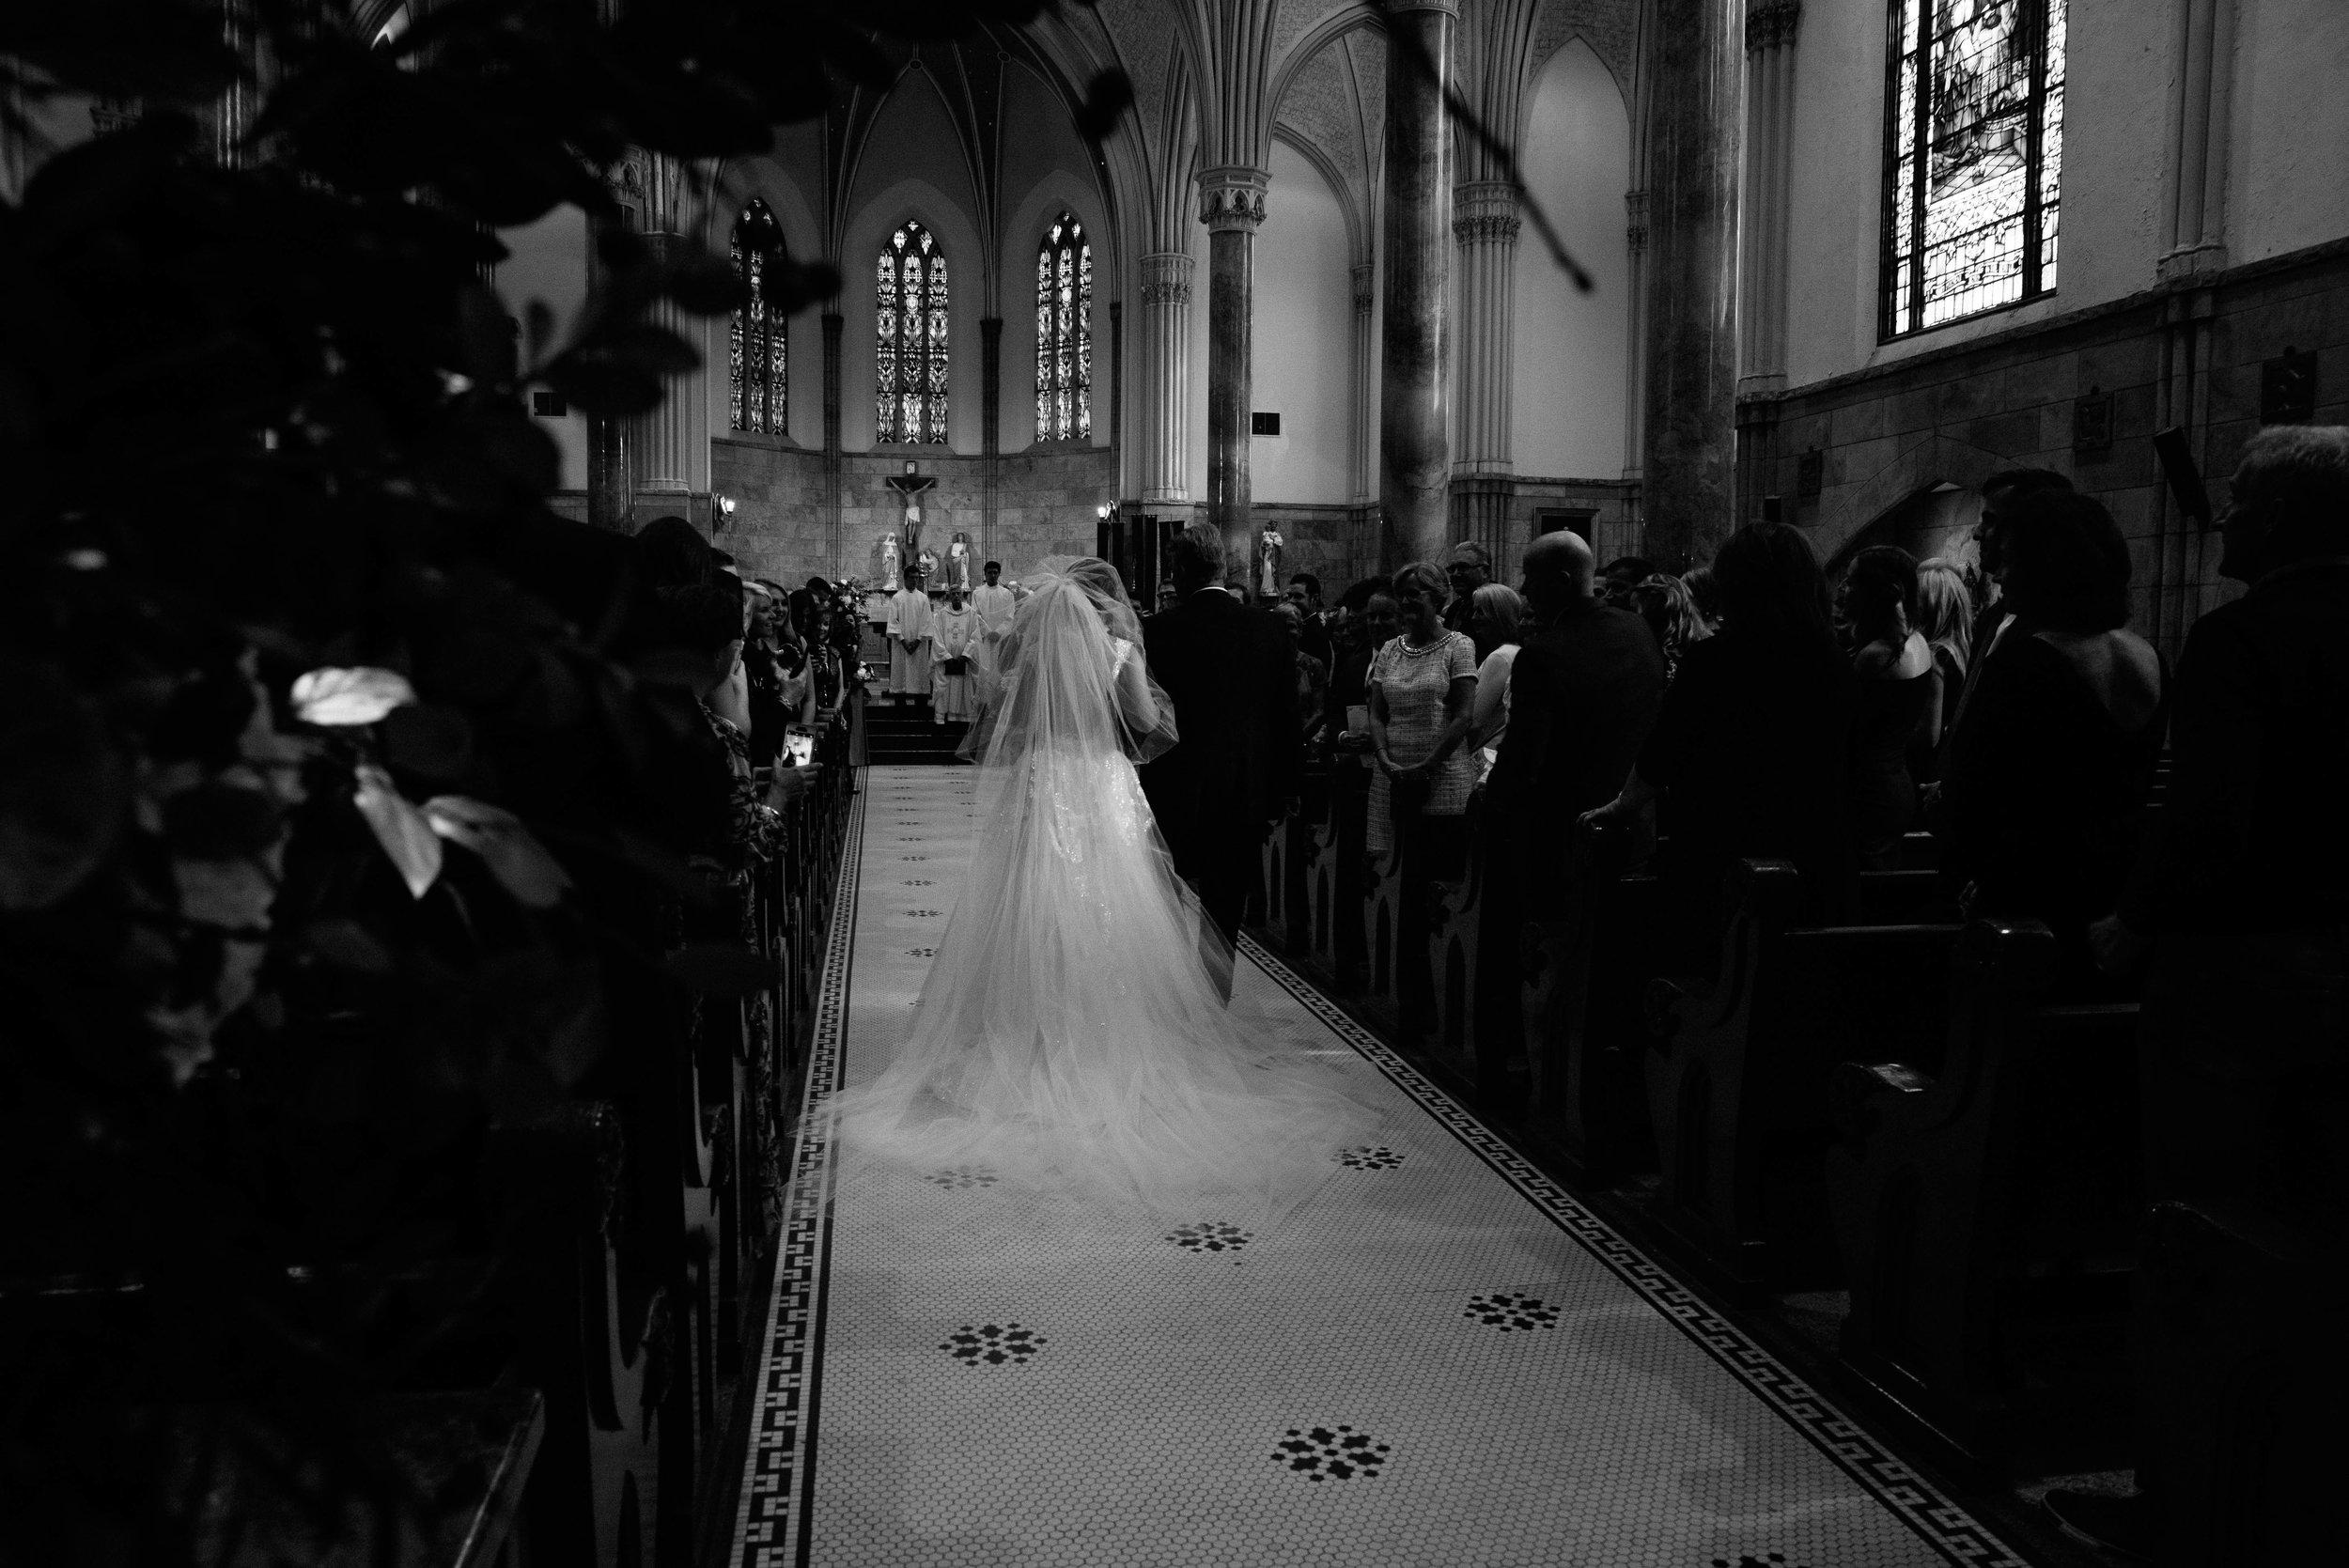 Carlee-Bob-Indianapolis-Wedding-Blog-51.jpg